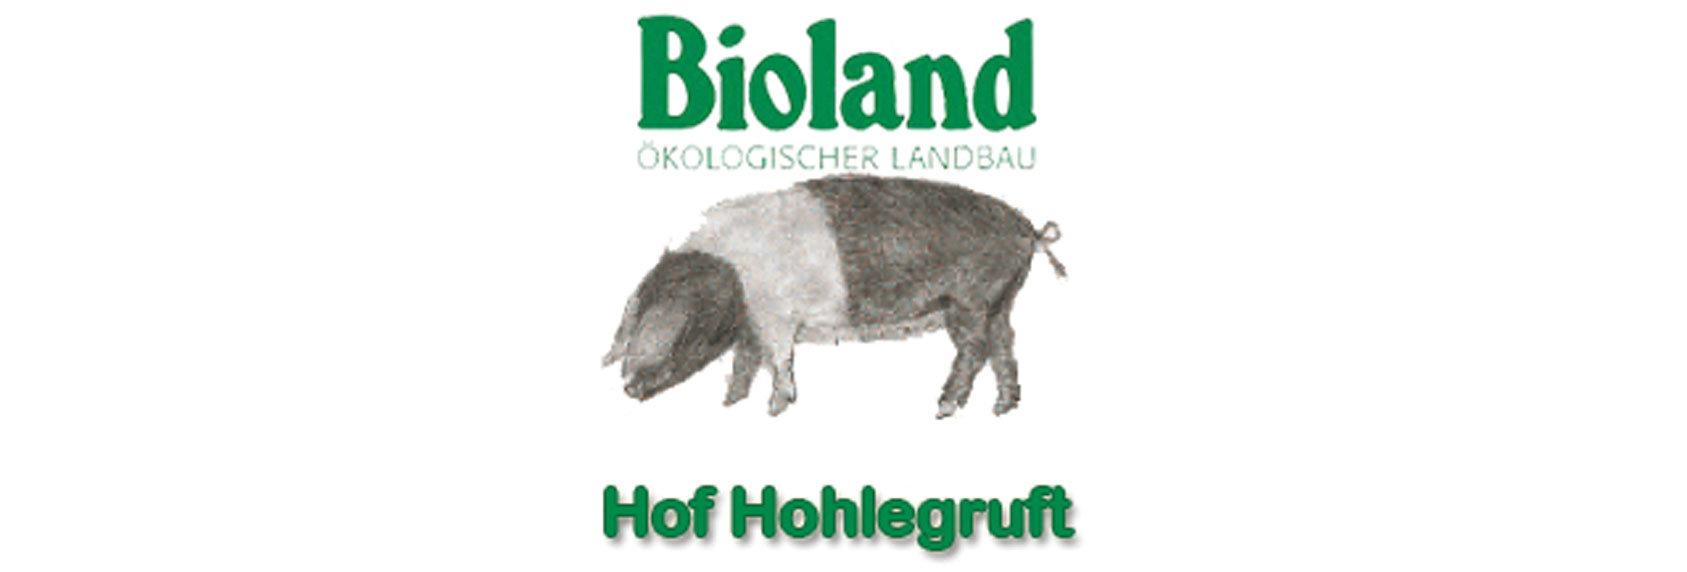 Bioland Hof Hohlegruft